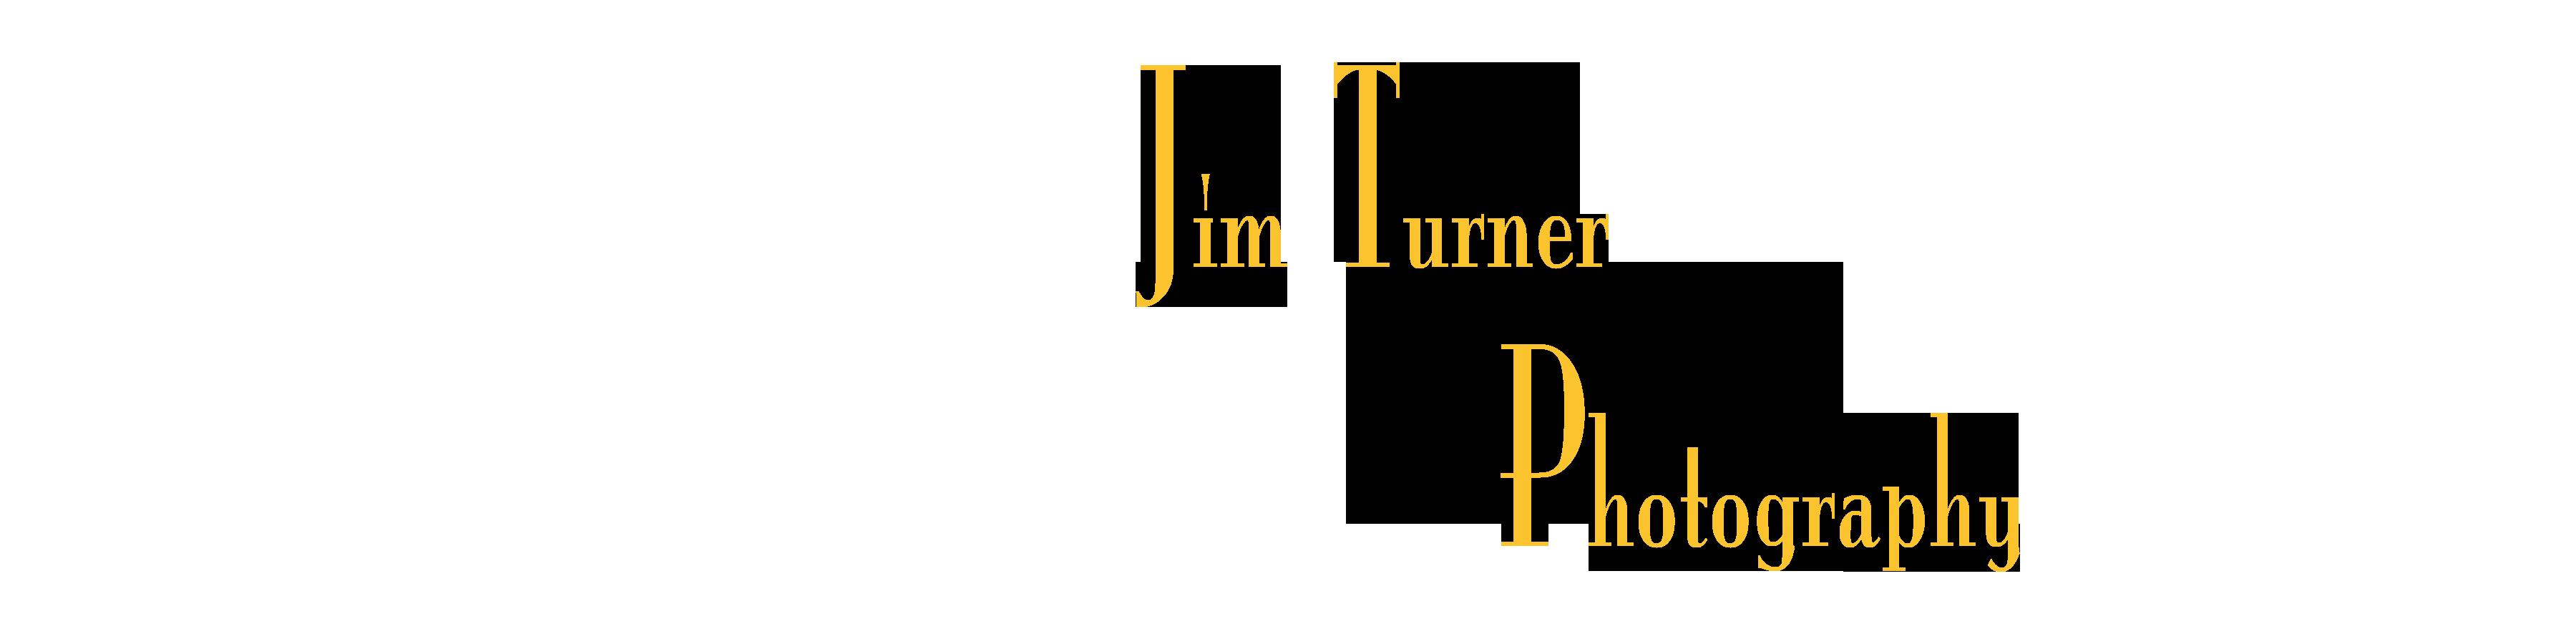 TURNER PHOTOGRAPHY